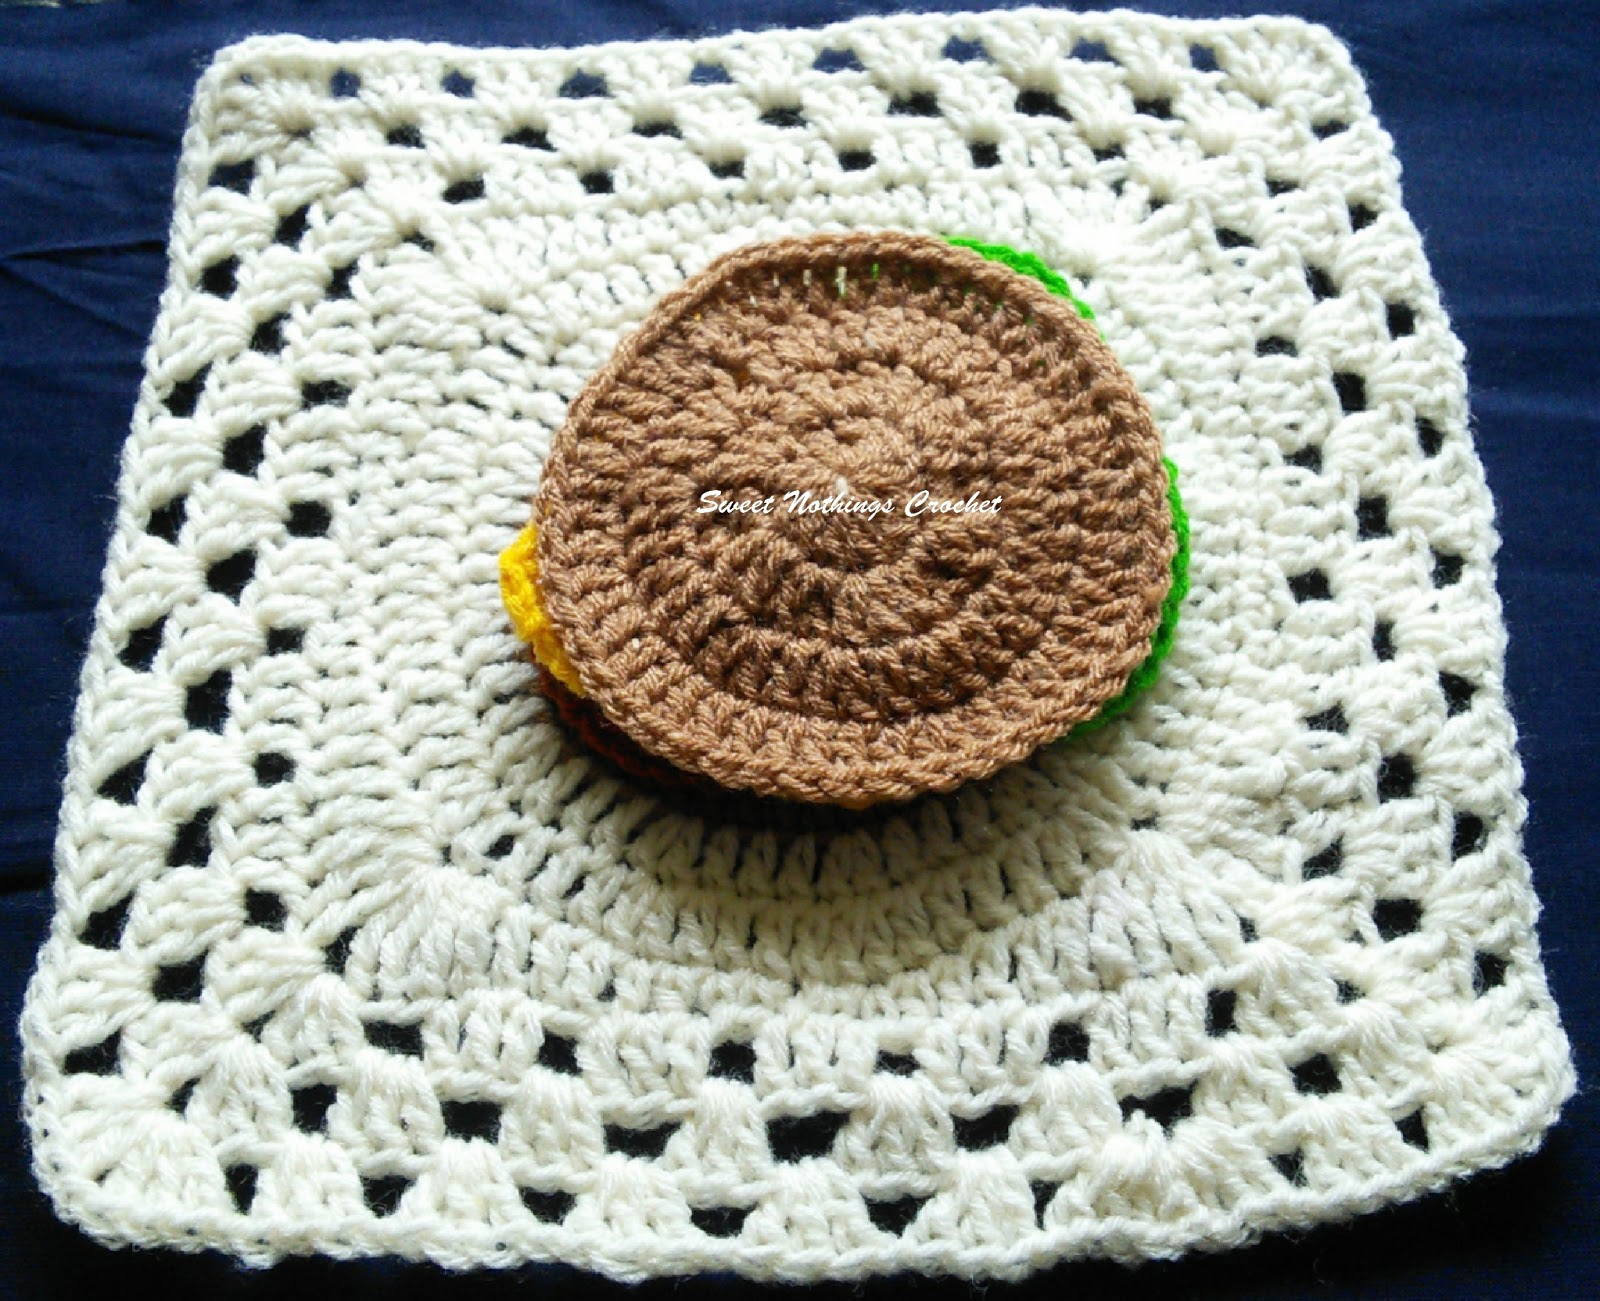 Sweet Nothings Crochet